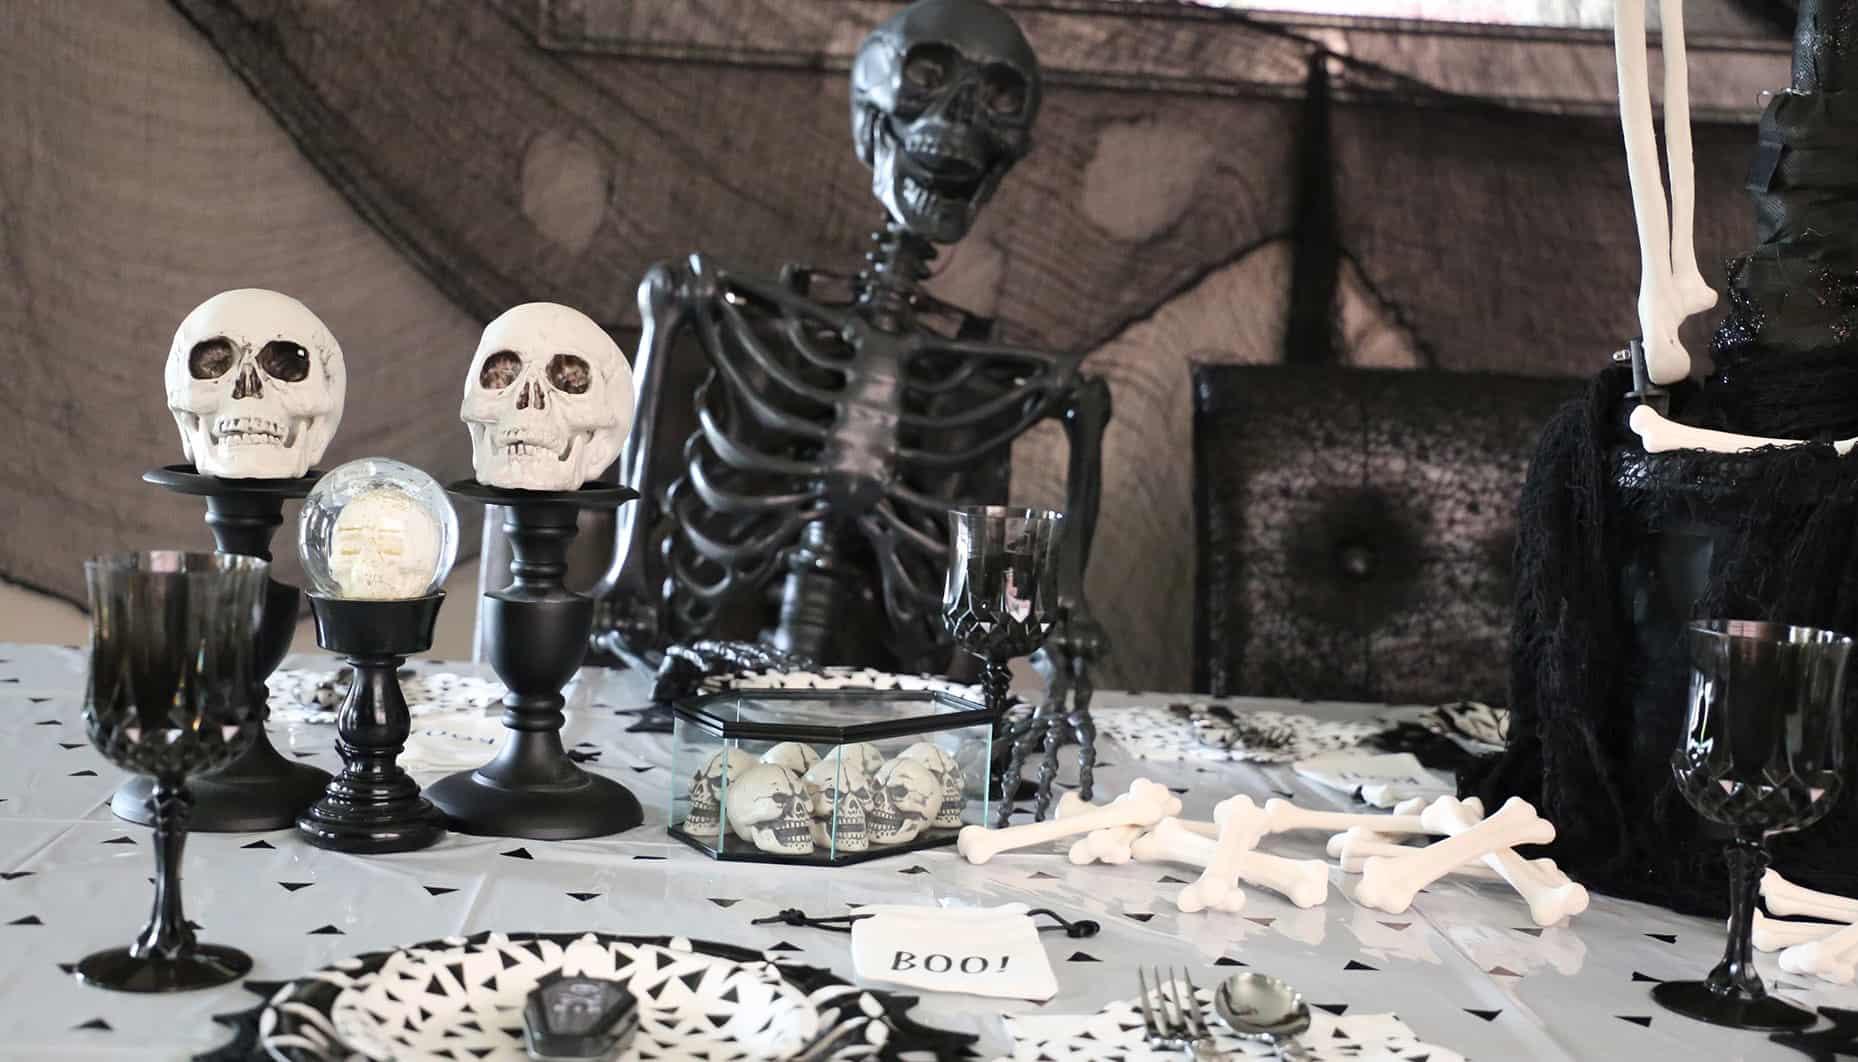 skeleton on table